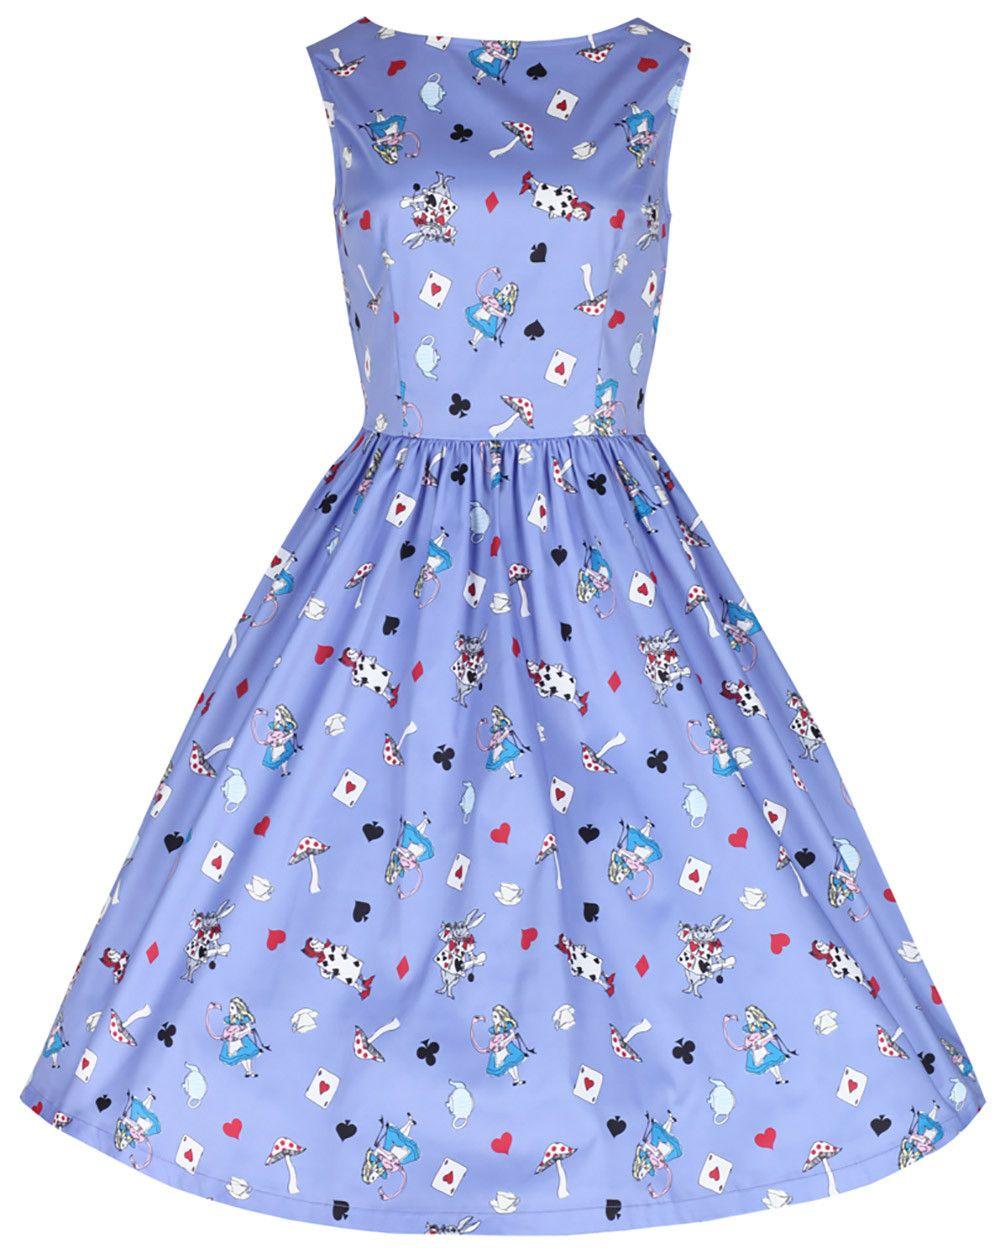 Audrey\' Lilac Alice In Wonderland Print Swing Dress